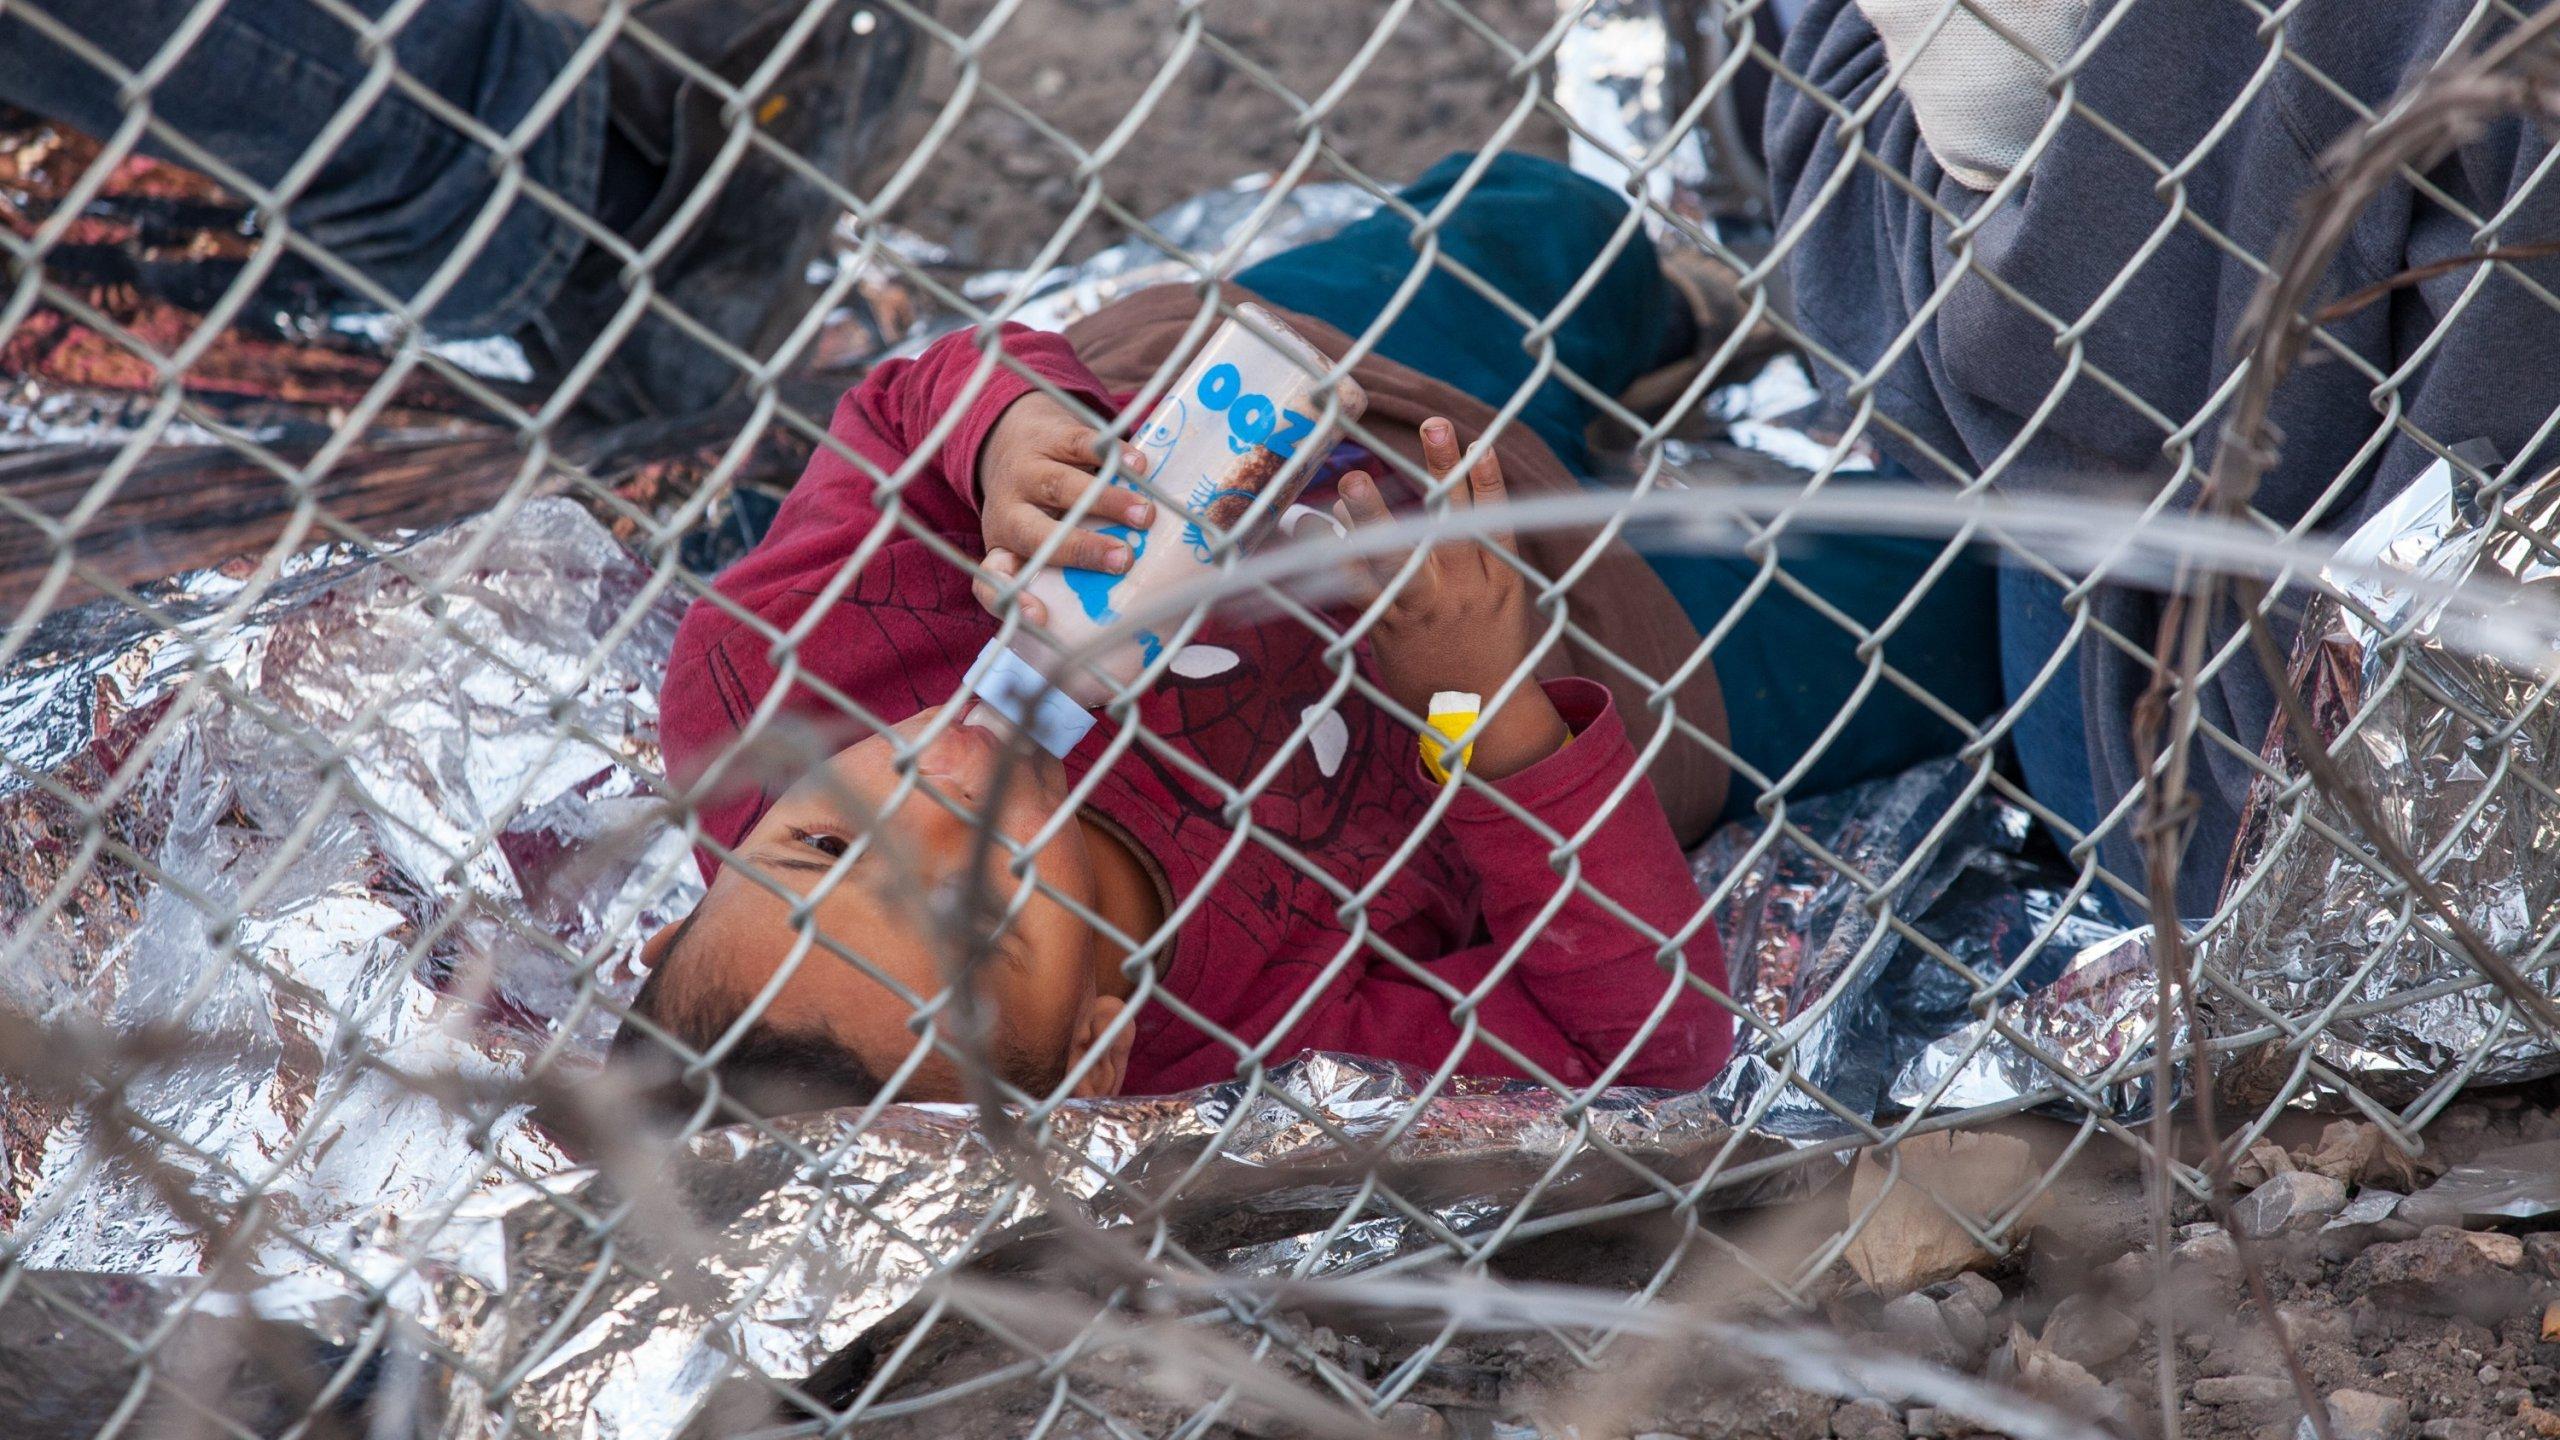 migrant children detention center